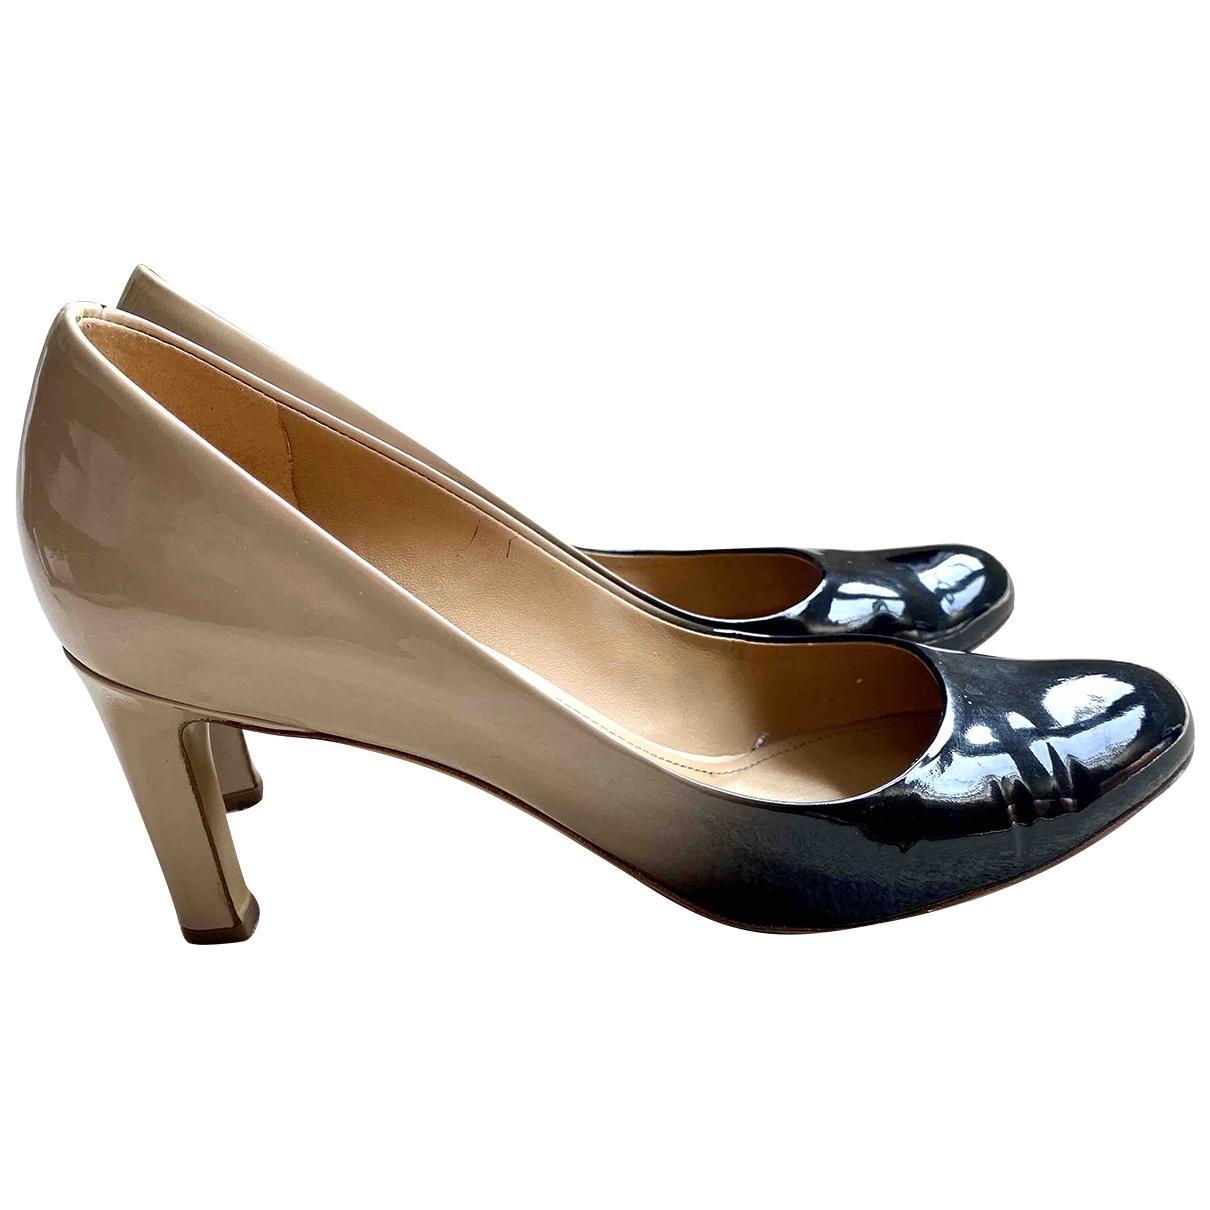 Salvatore Ferragamo \N Multicolour Patent leather Heels for Women 6.5 US